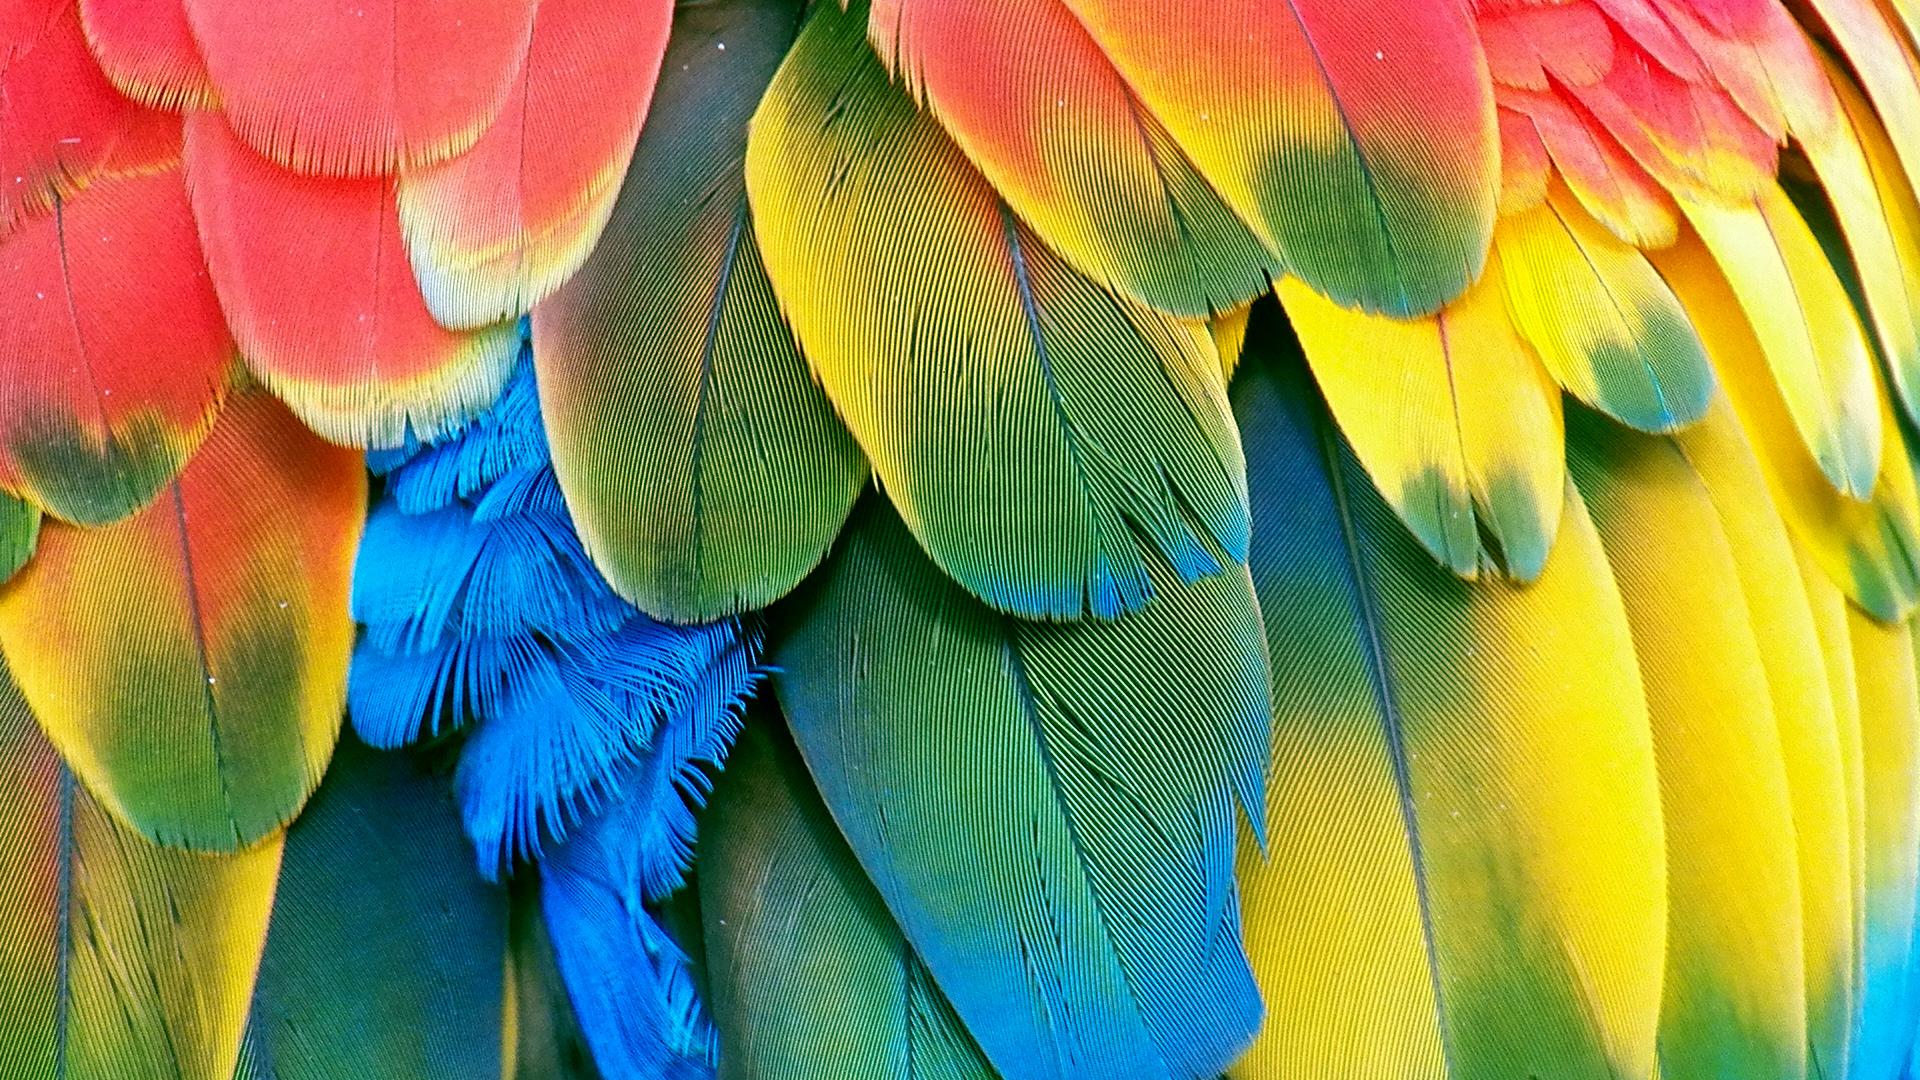 Feathers · Feathers · Feathers · Feathers ...